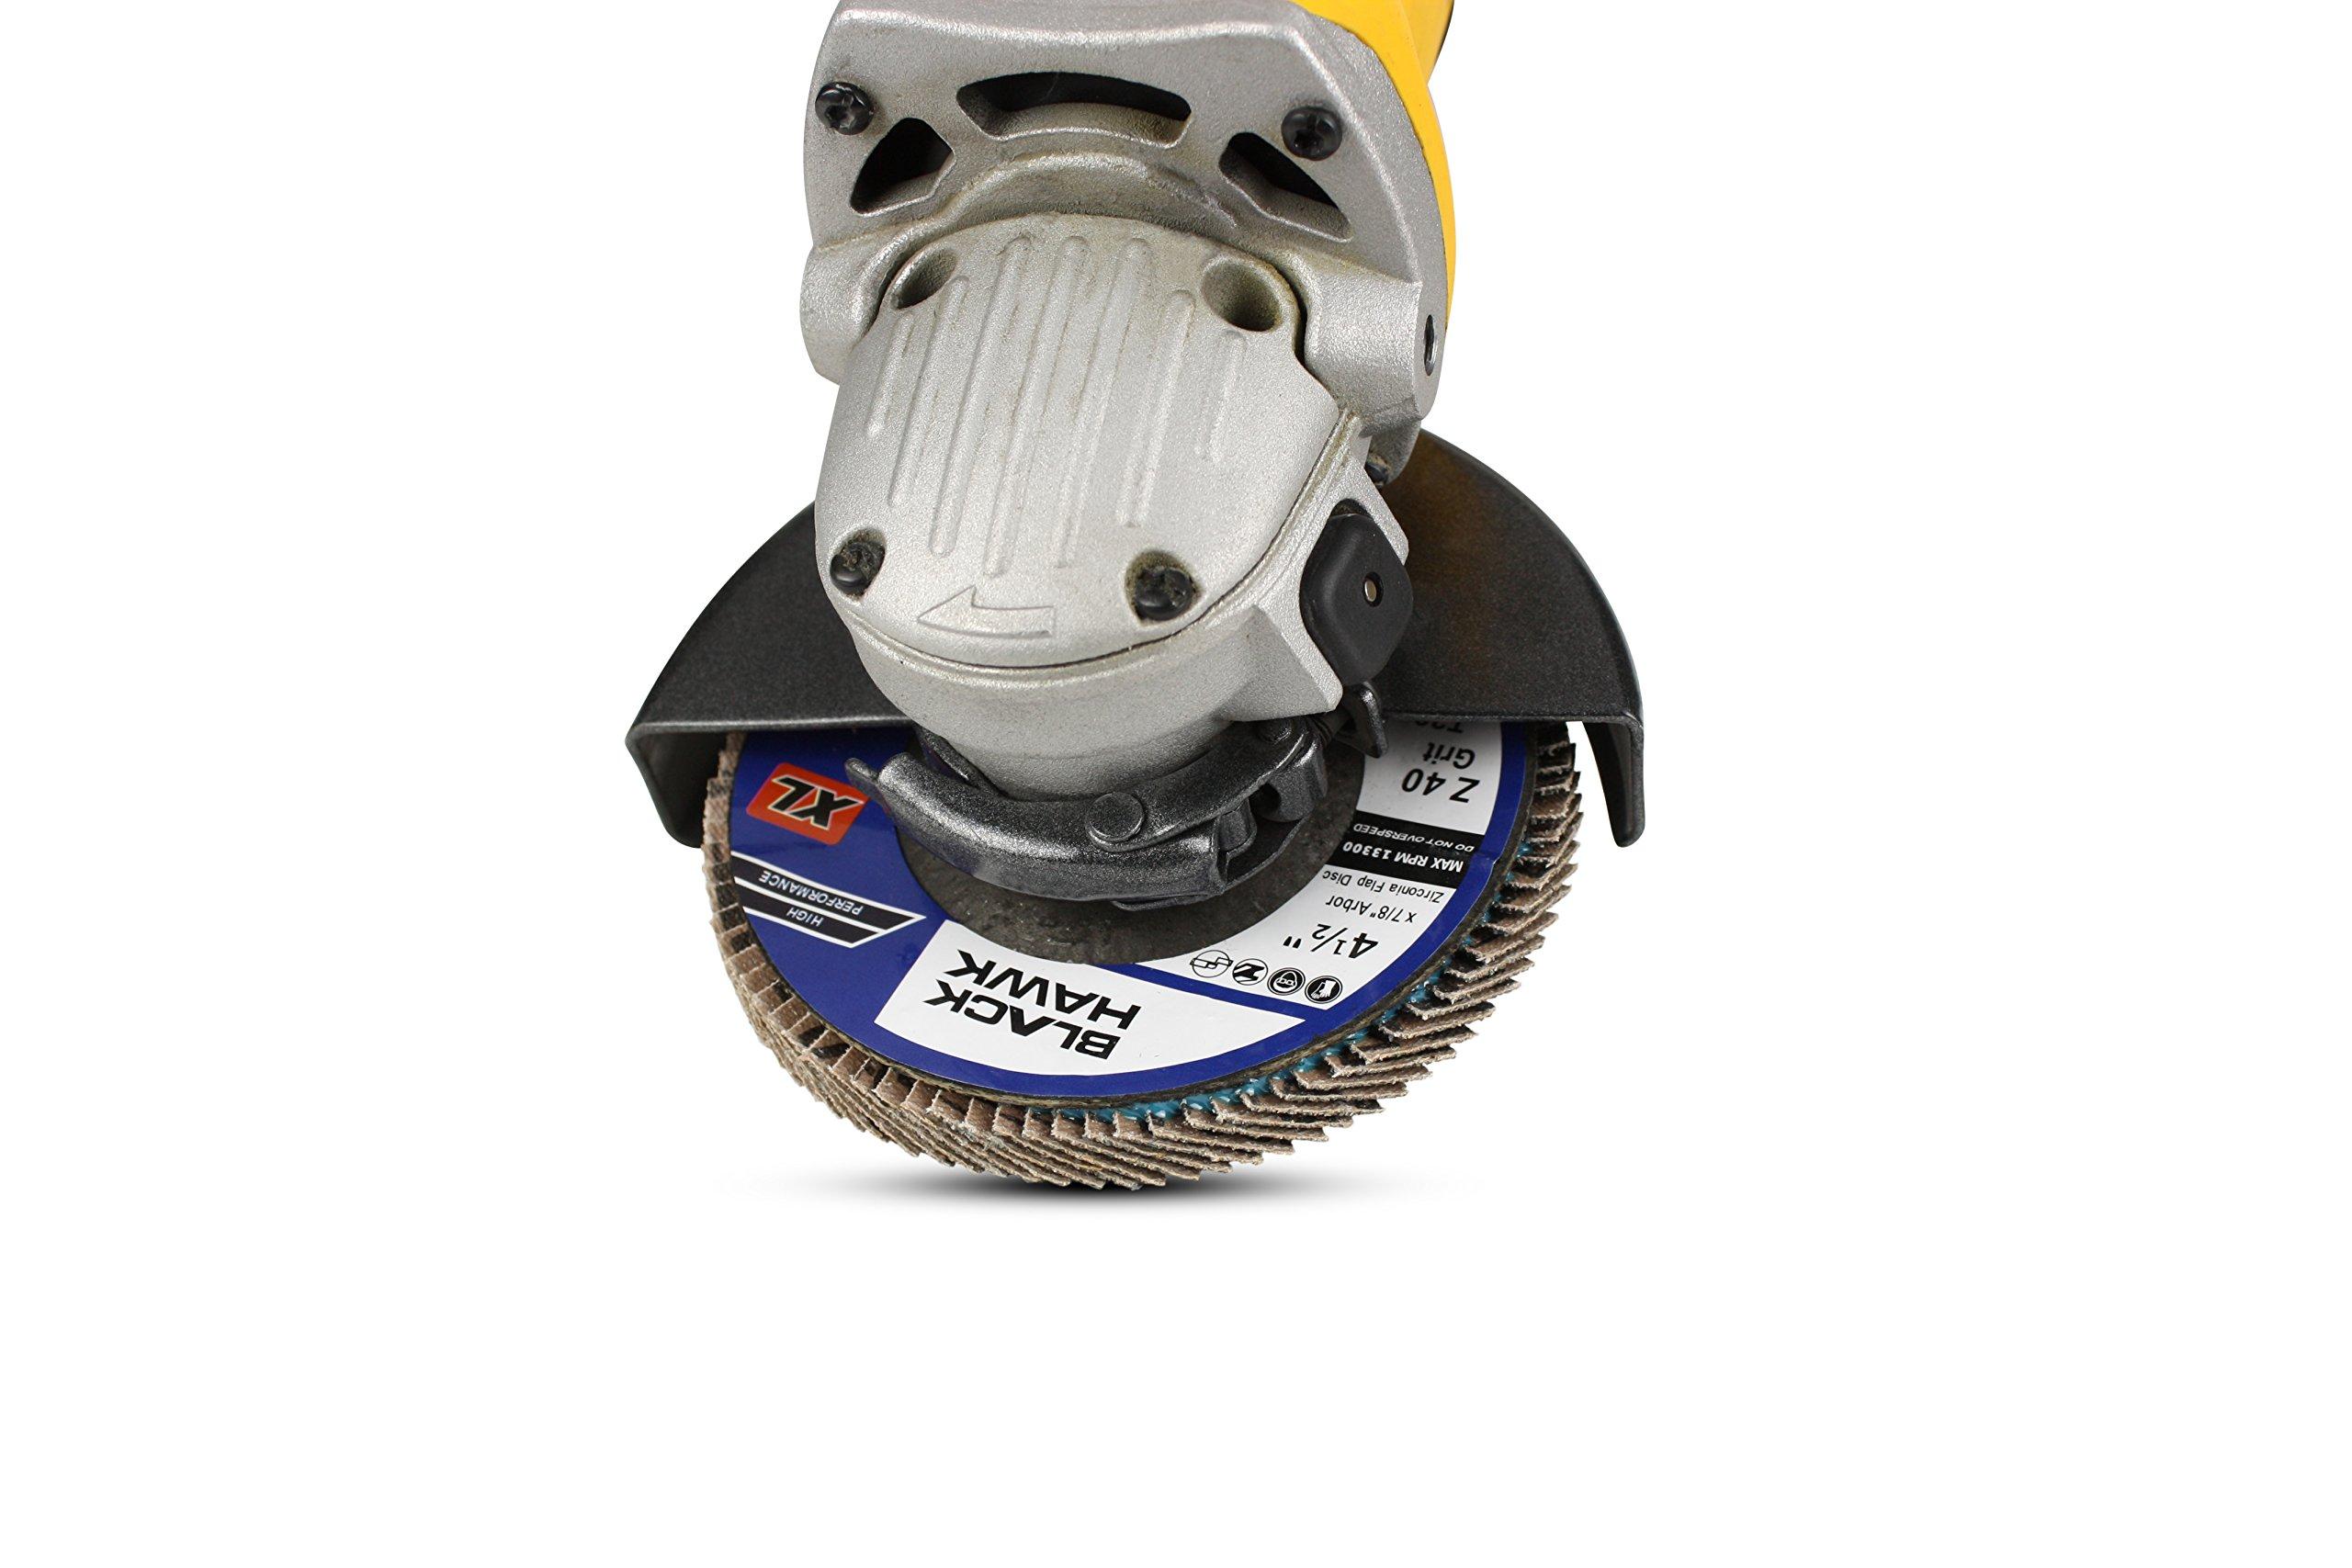 10 Pack - 4.5'' x 7/8'' XL High Density Zirconia Flap Discs Jumbo Grinding Wheels Type 29 (36 Grit)…